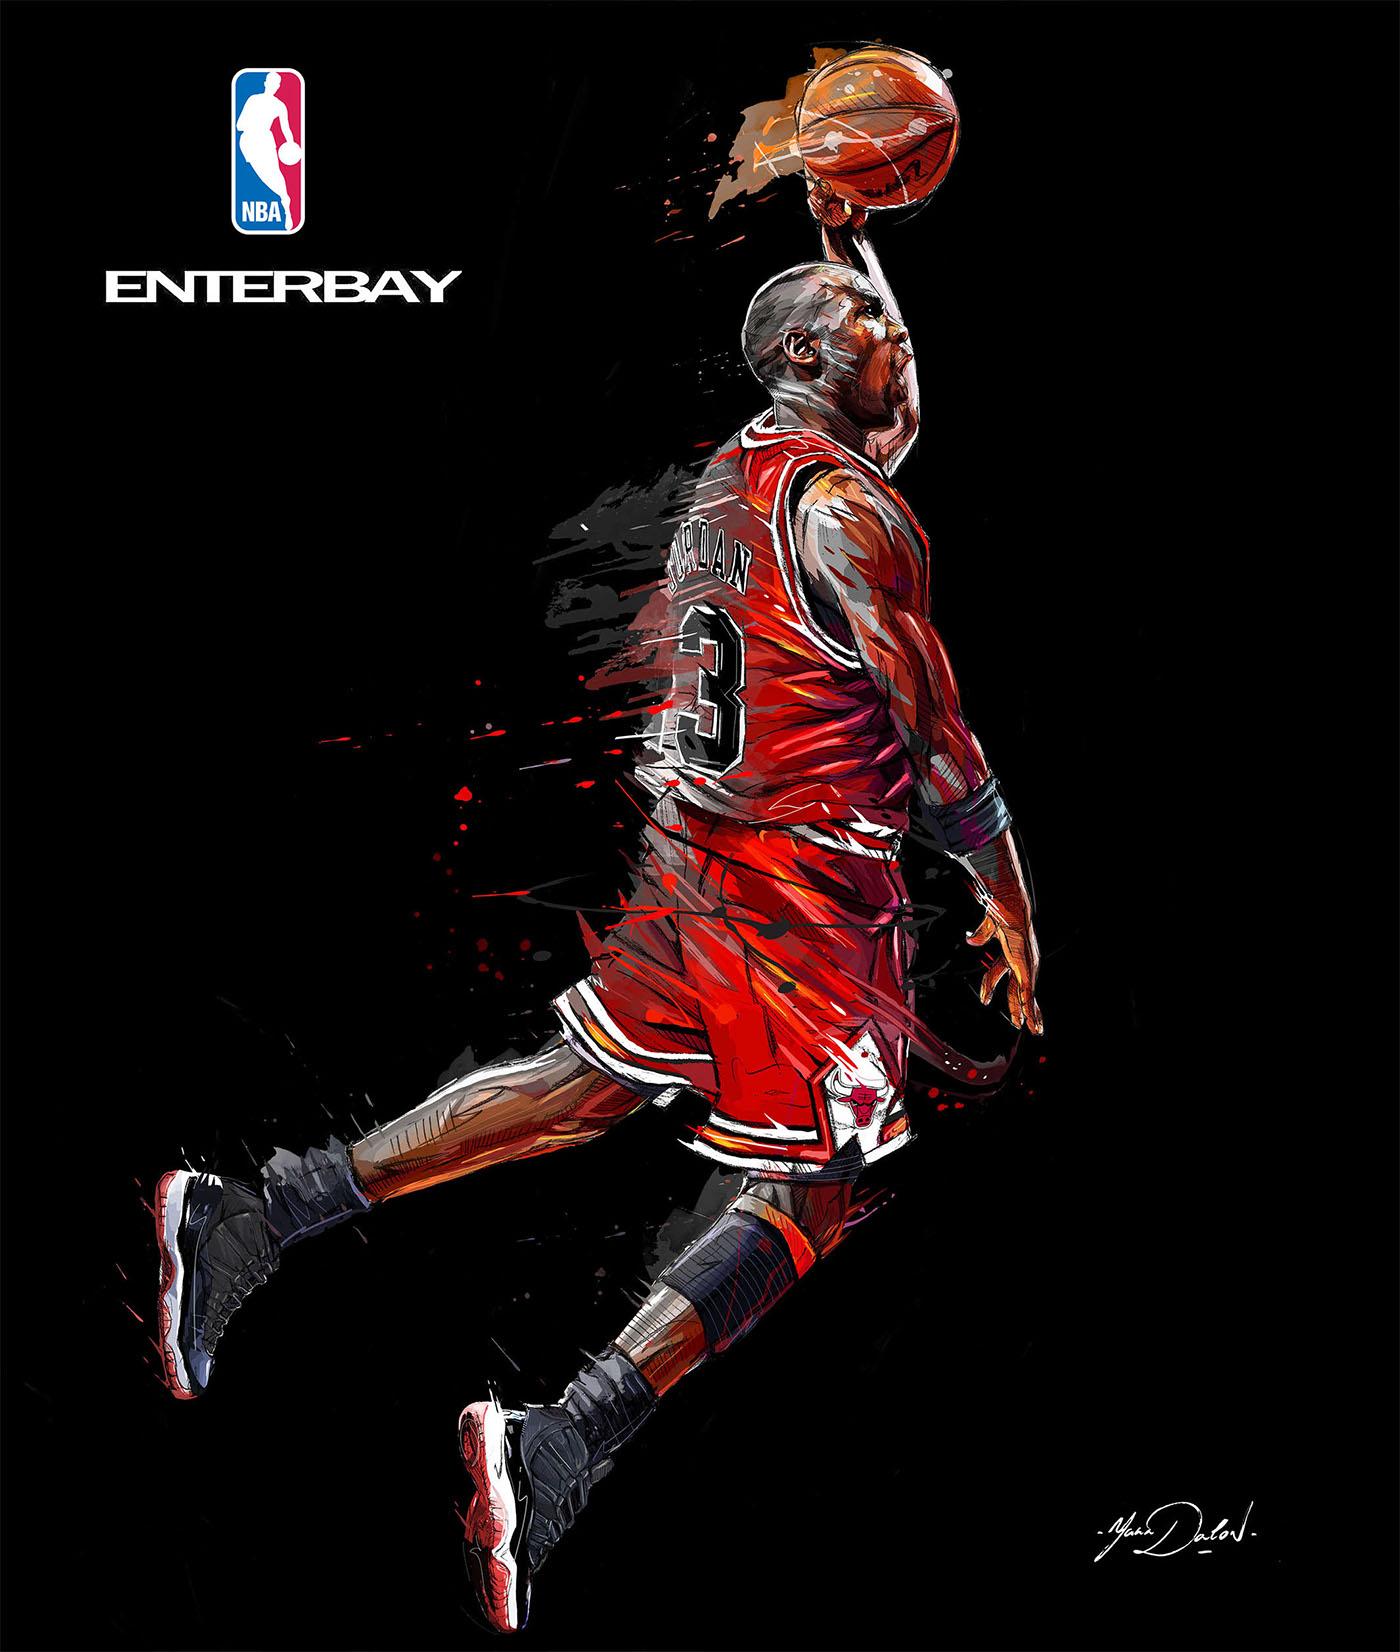 NBA/ ENTERBAY. Chicago Bulls Legends. On Behance